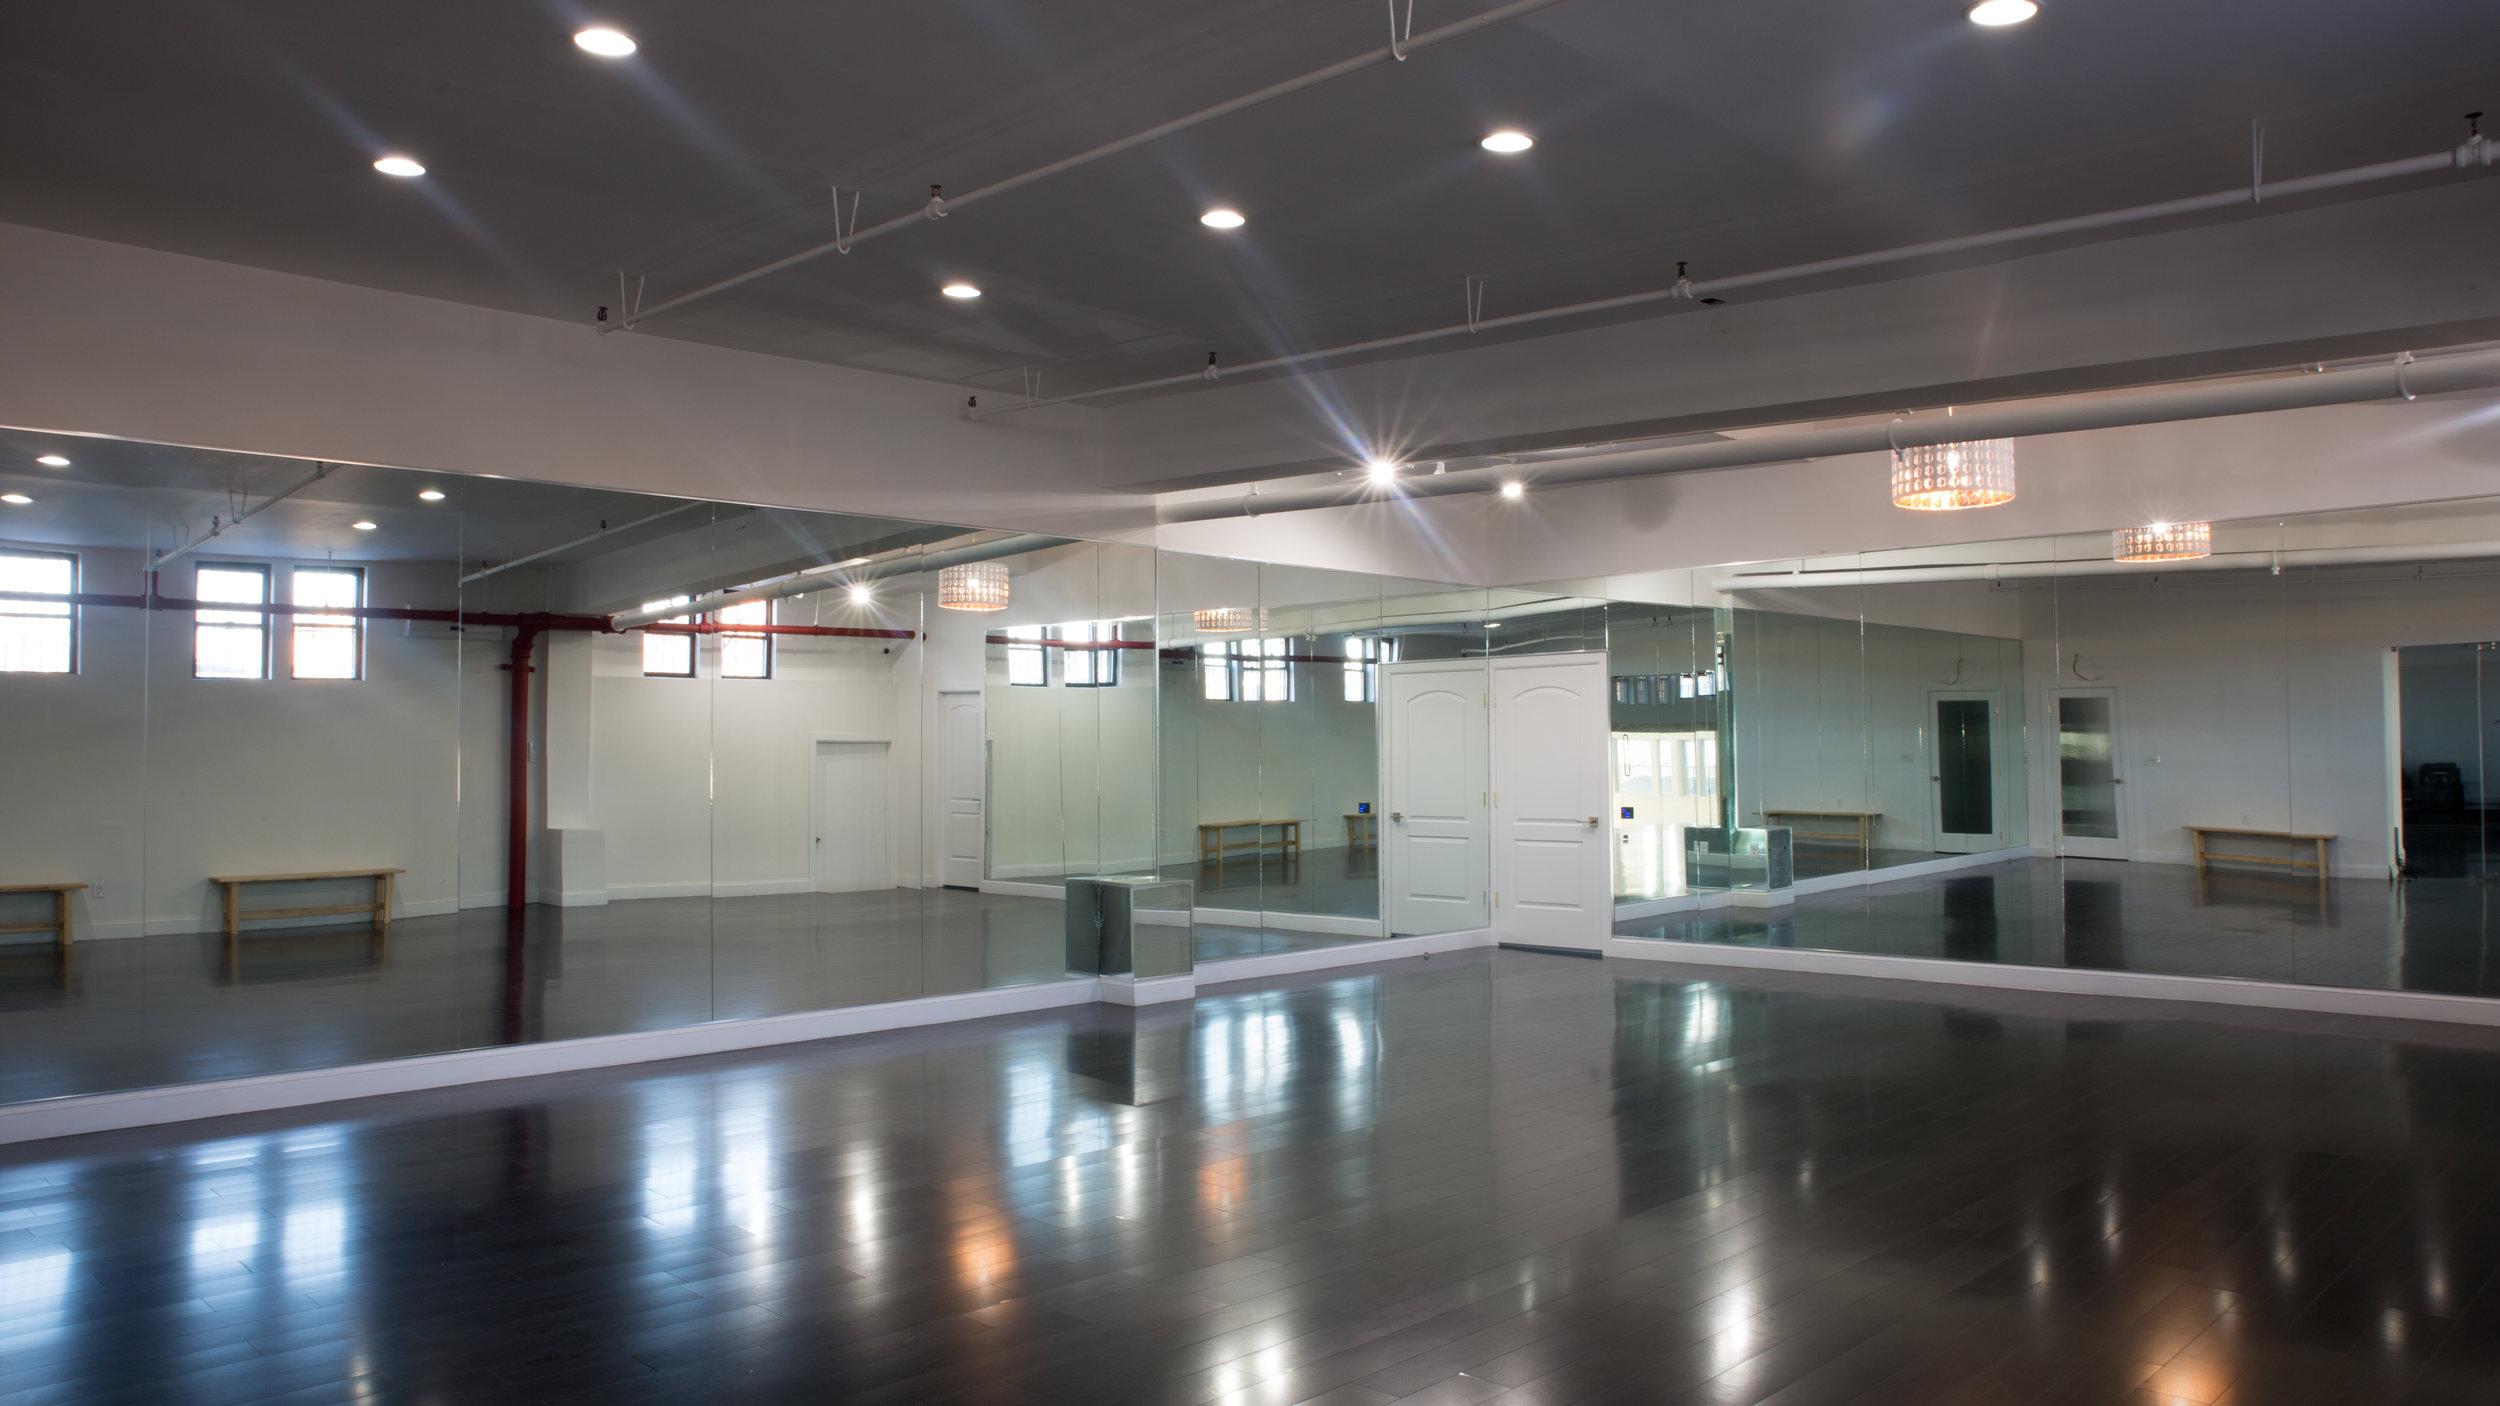 BMJ_Studios_dance_studio_rehearsal.jpg